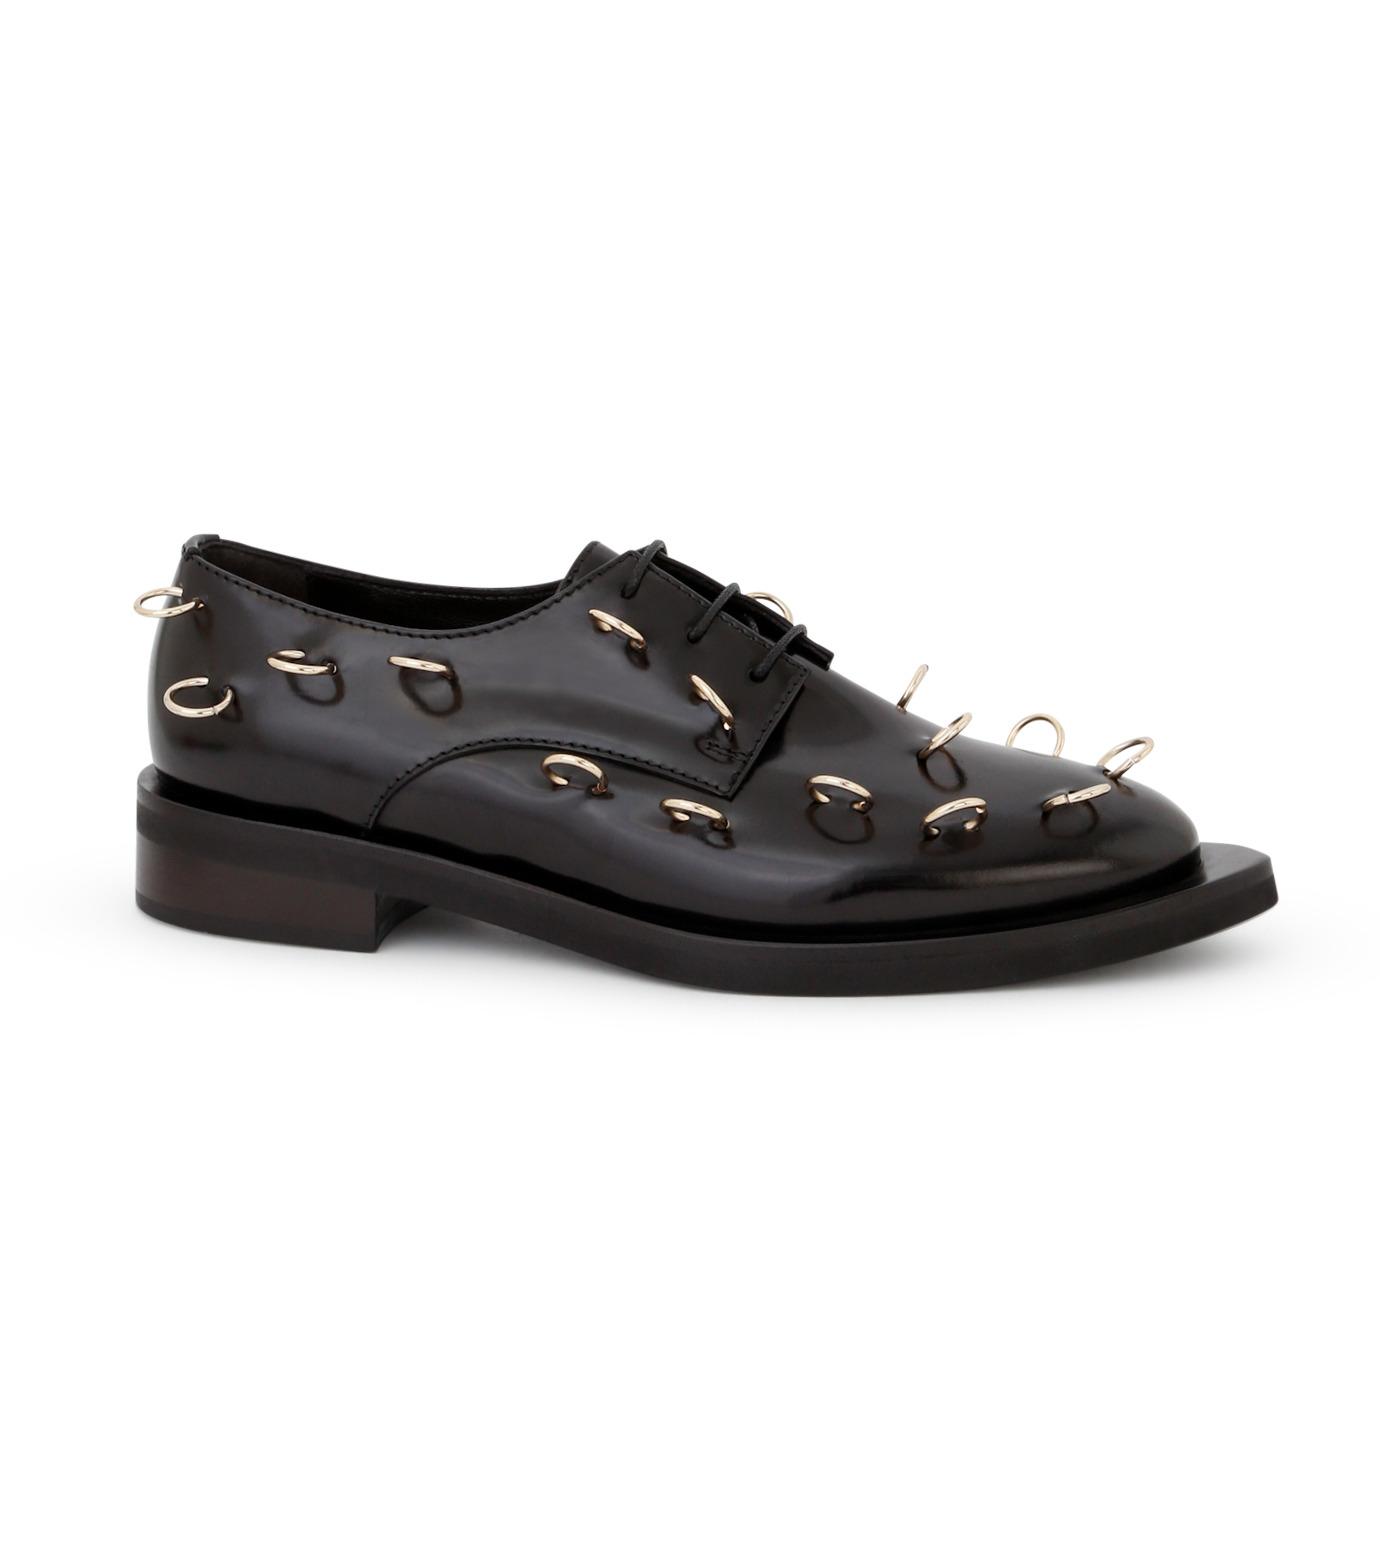 Coliac(コリアック)のRei Rings-BLACK(フラットシューズ/Flat shoes)-64CC023-13 拡大詳細画像1